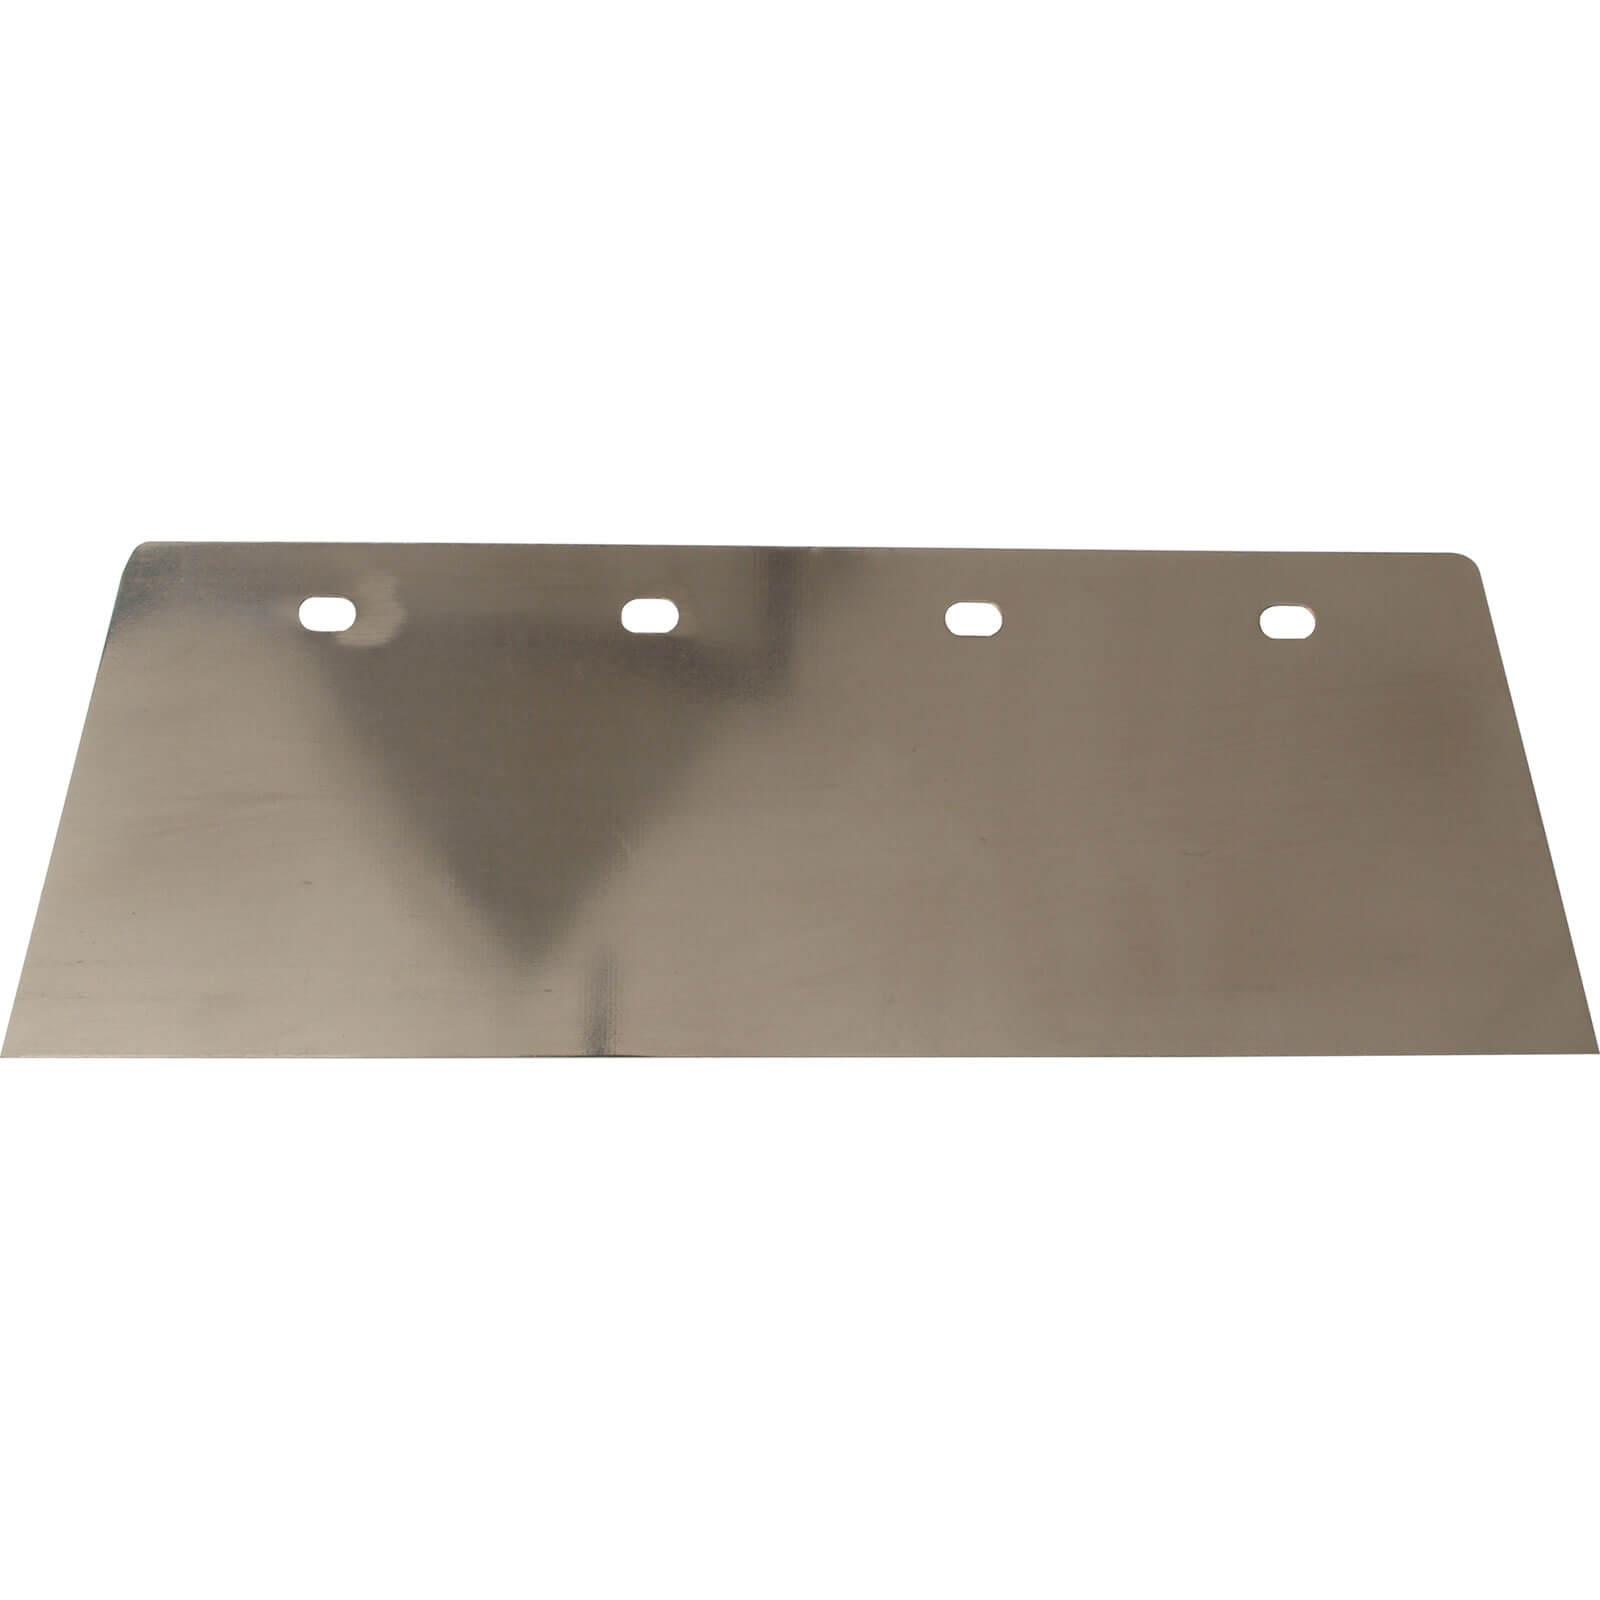 Roughneck Stainless Steel Floor Scraper Blade 300mm